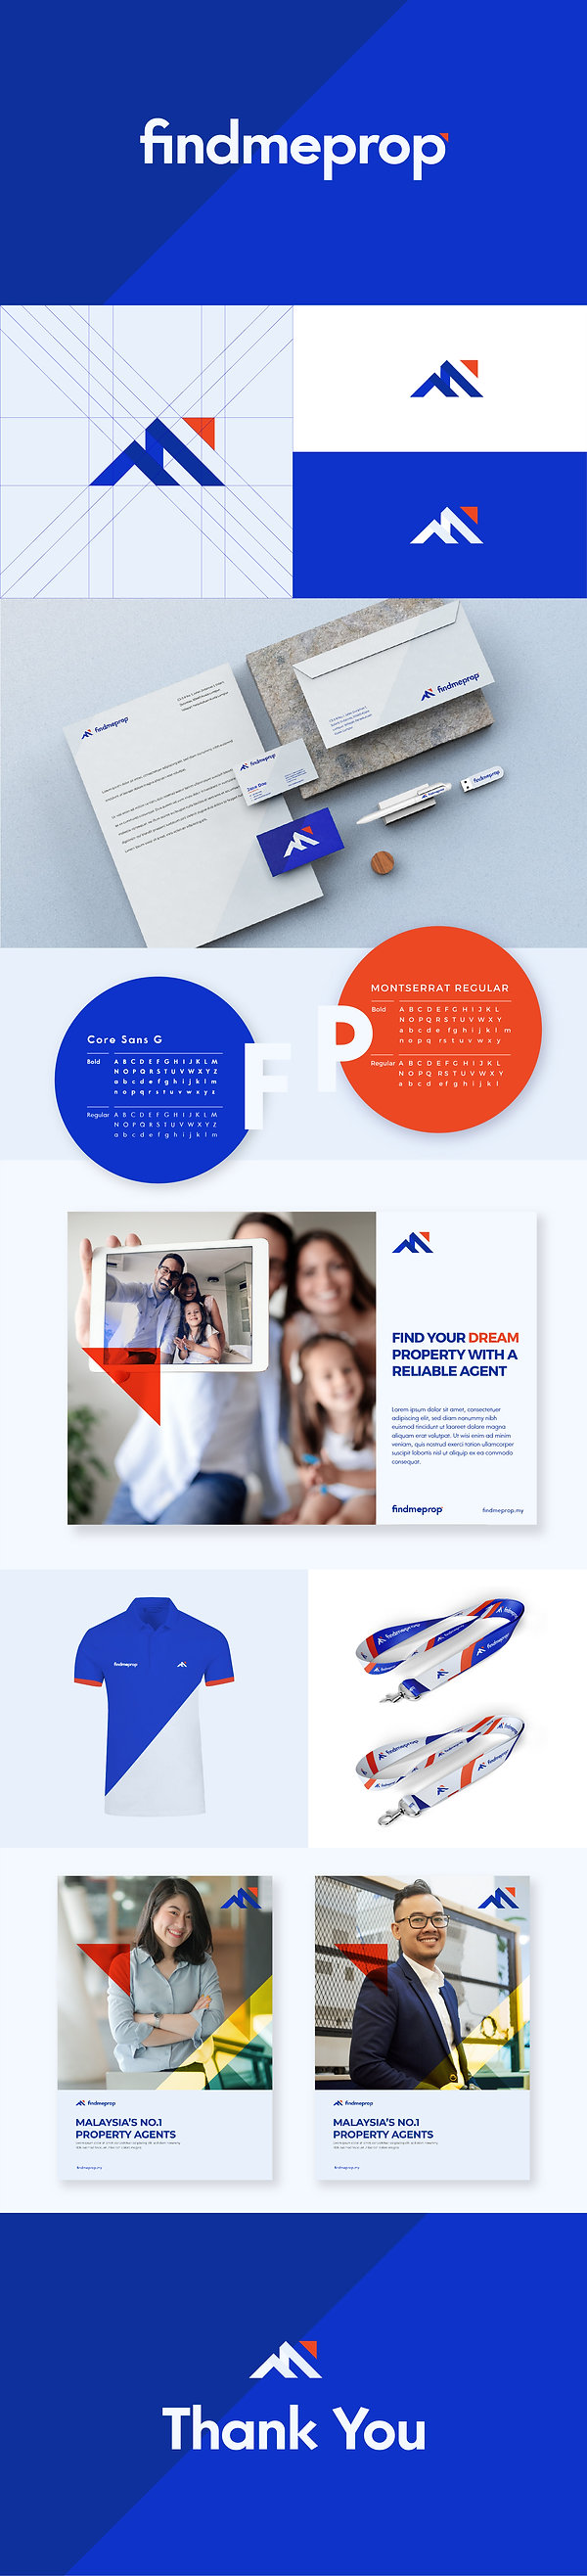 FMP_web presentation-01 (1).jpg